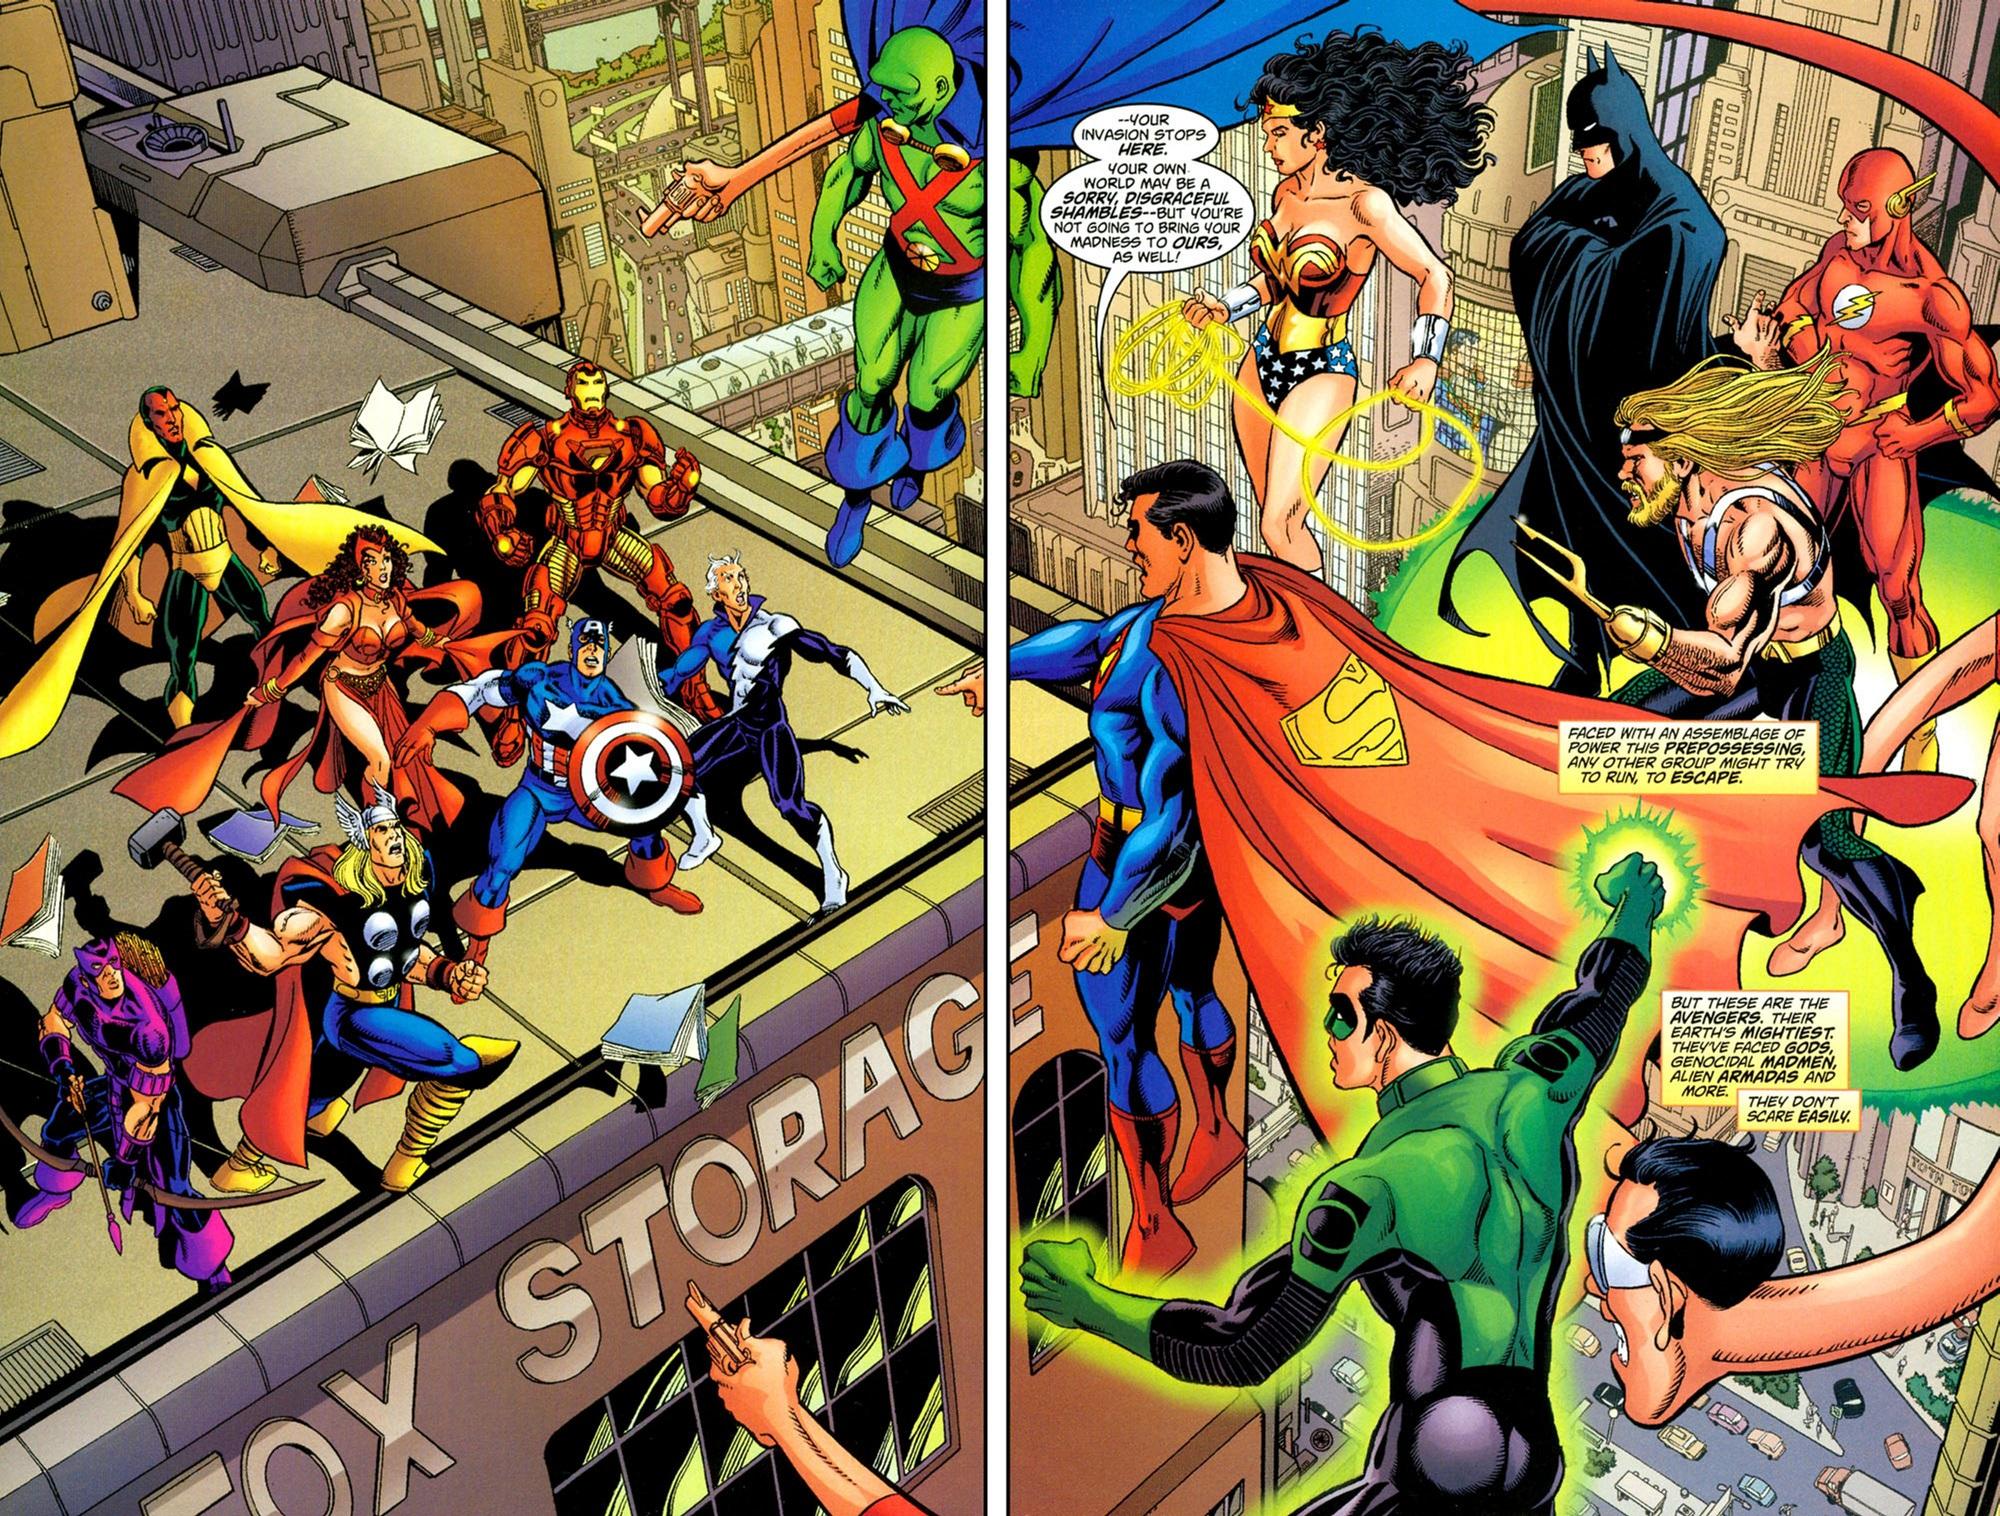 Quand les Avengers rencontrent JLA.